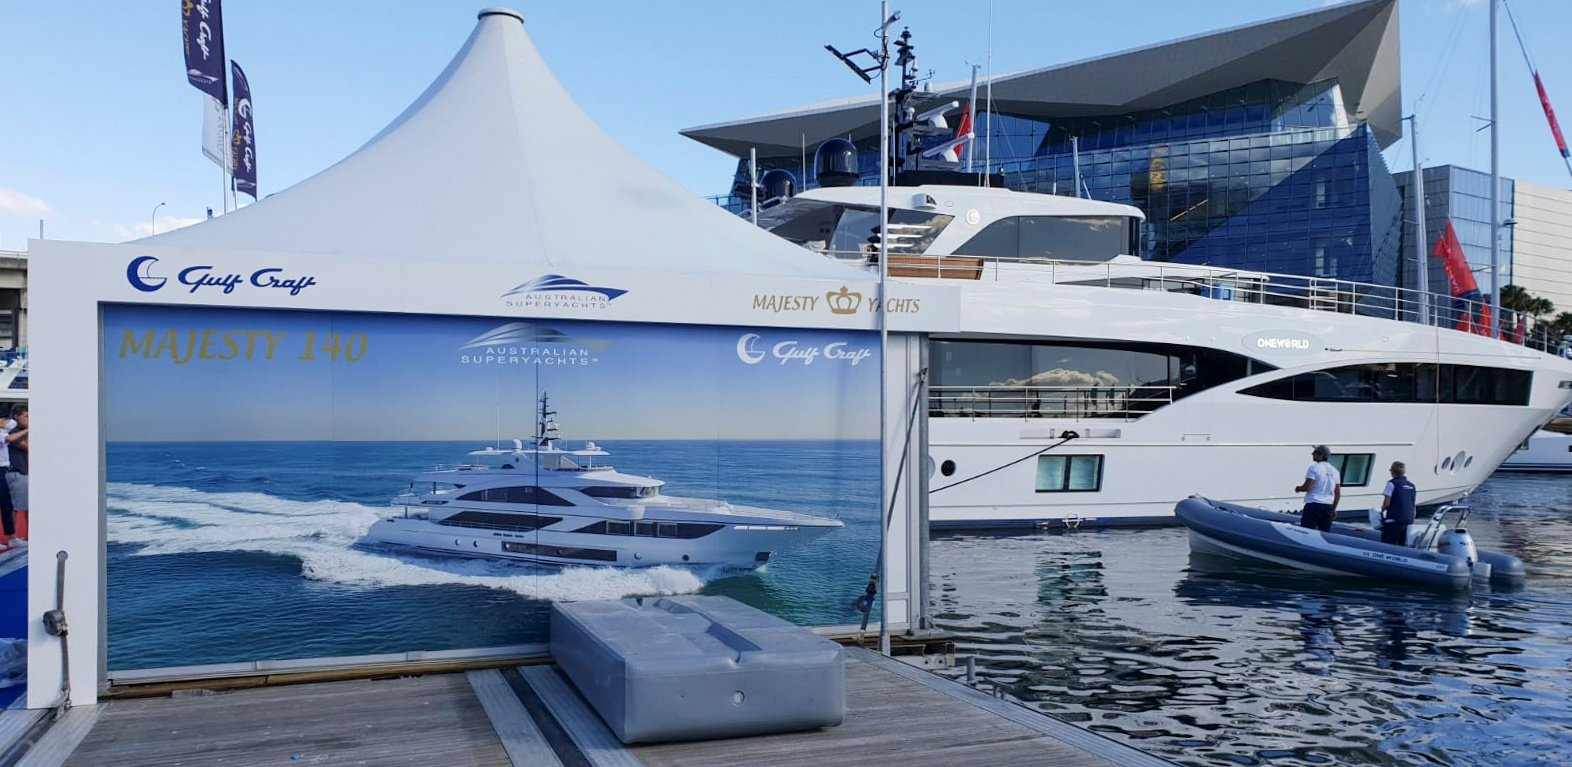 Gulf Craft at Sydney International Boat Show 2018 (4).jpg